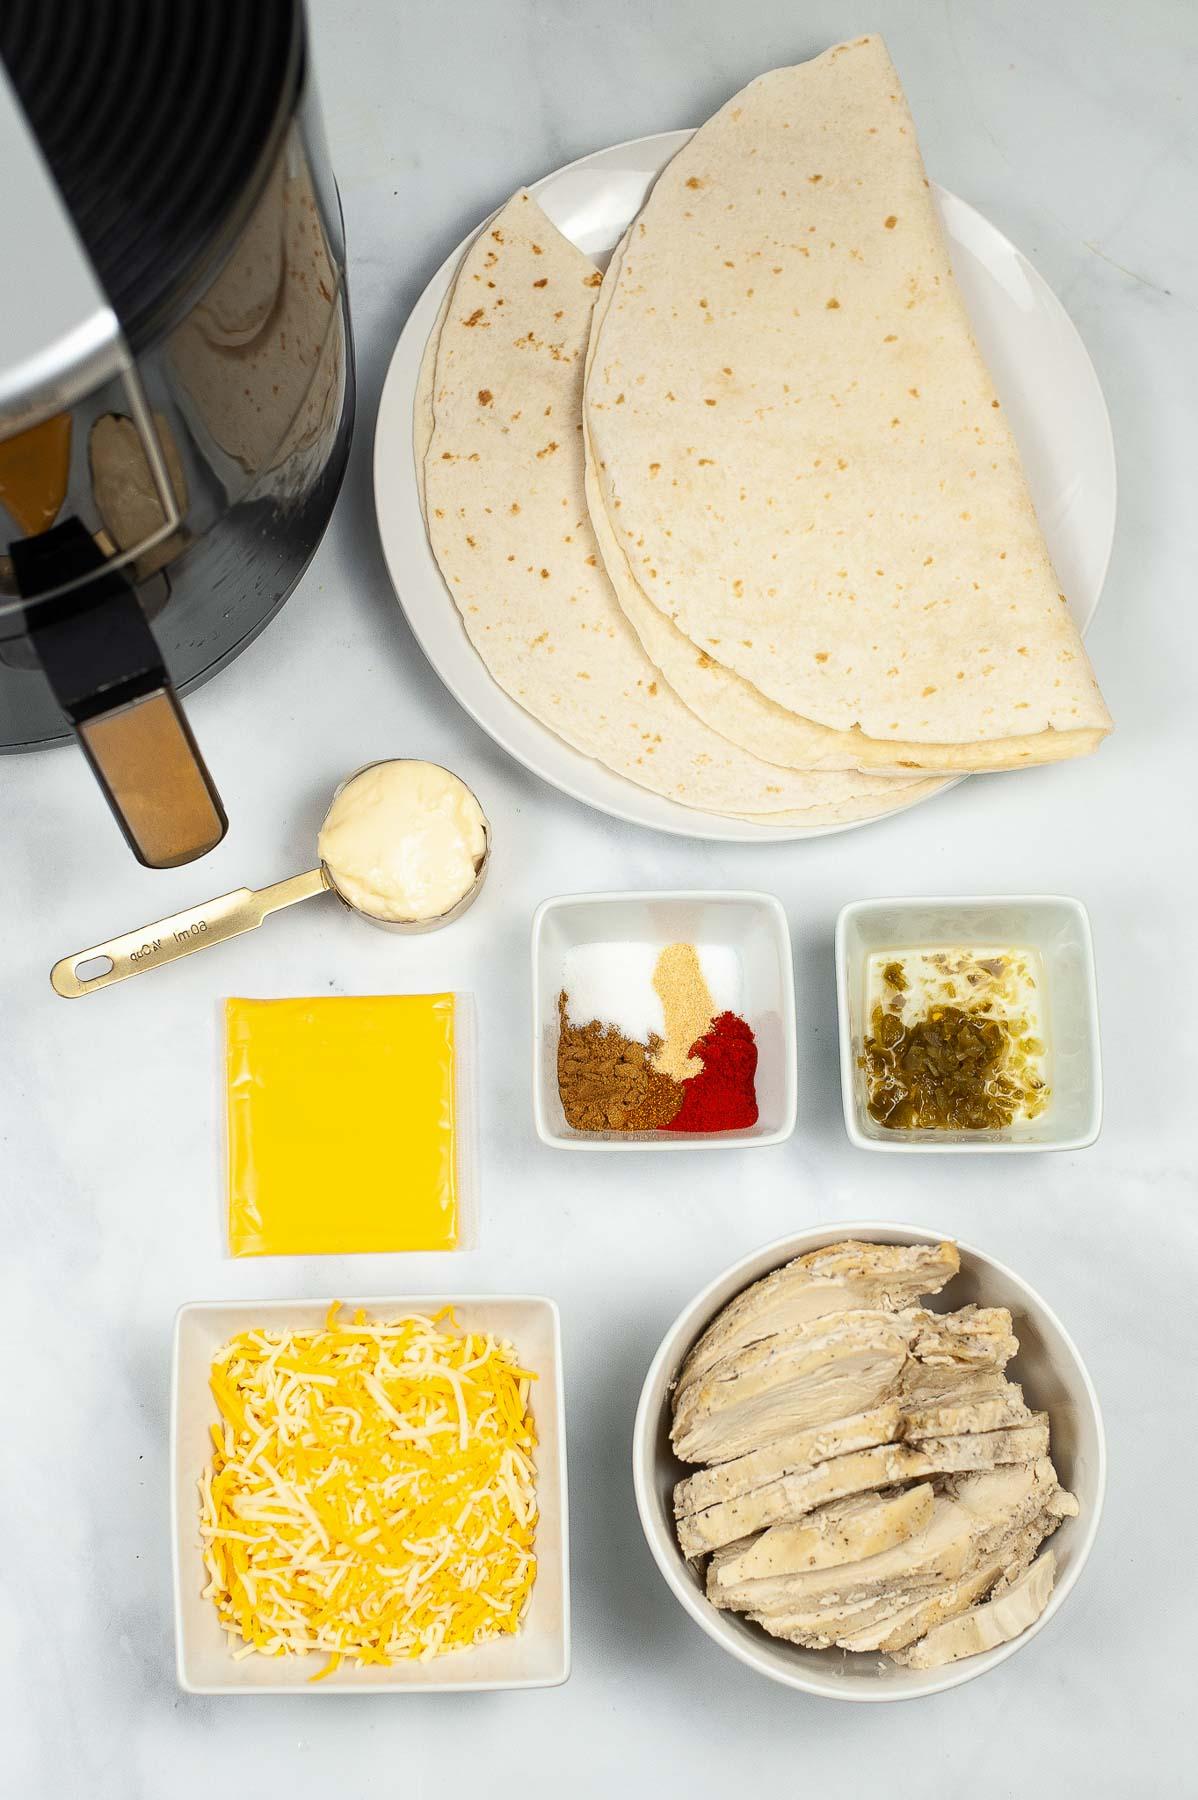 Ingredients for a copycat taco bell quesadilla recipe.